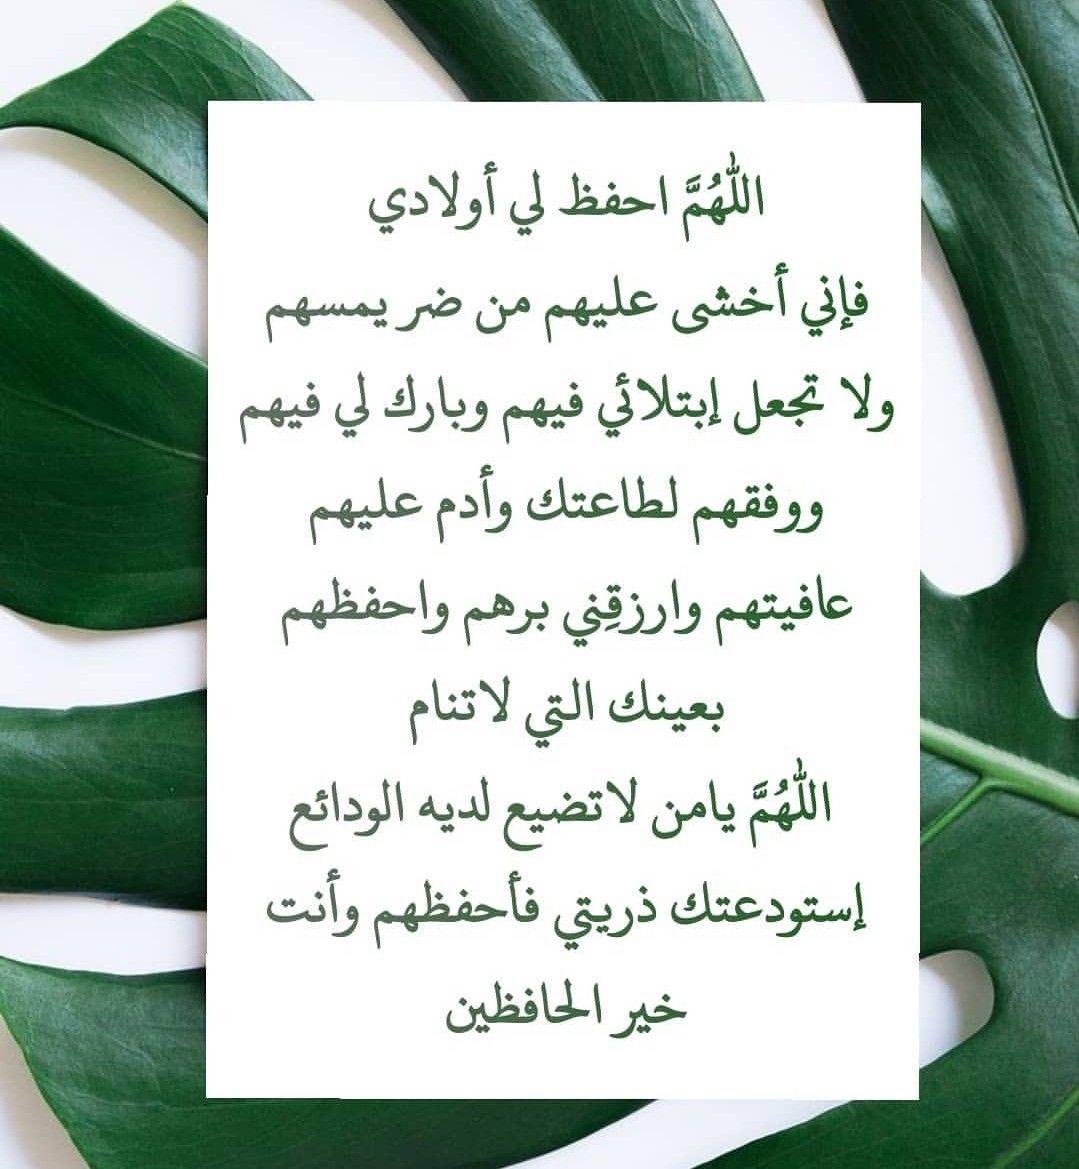 Pin By Ala A Al Mani On دعاء إلى رب غفور Life Quotes Words Of Wisdom Bad Girl Wallpaper